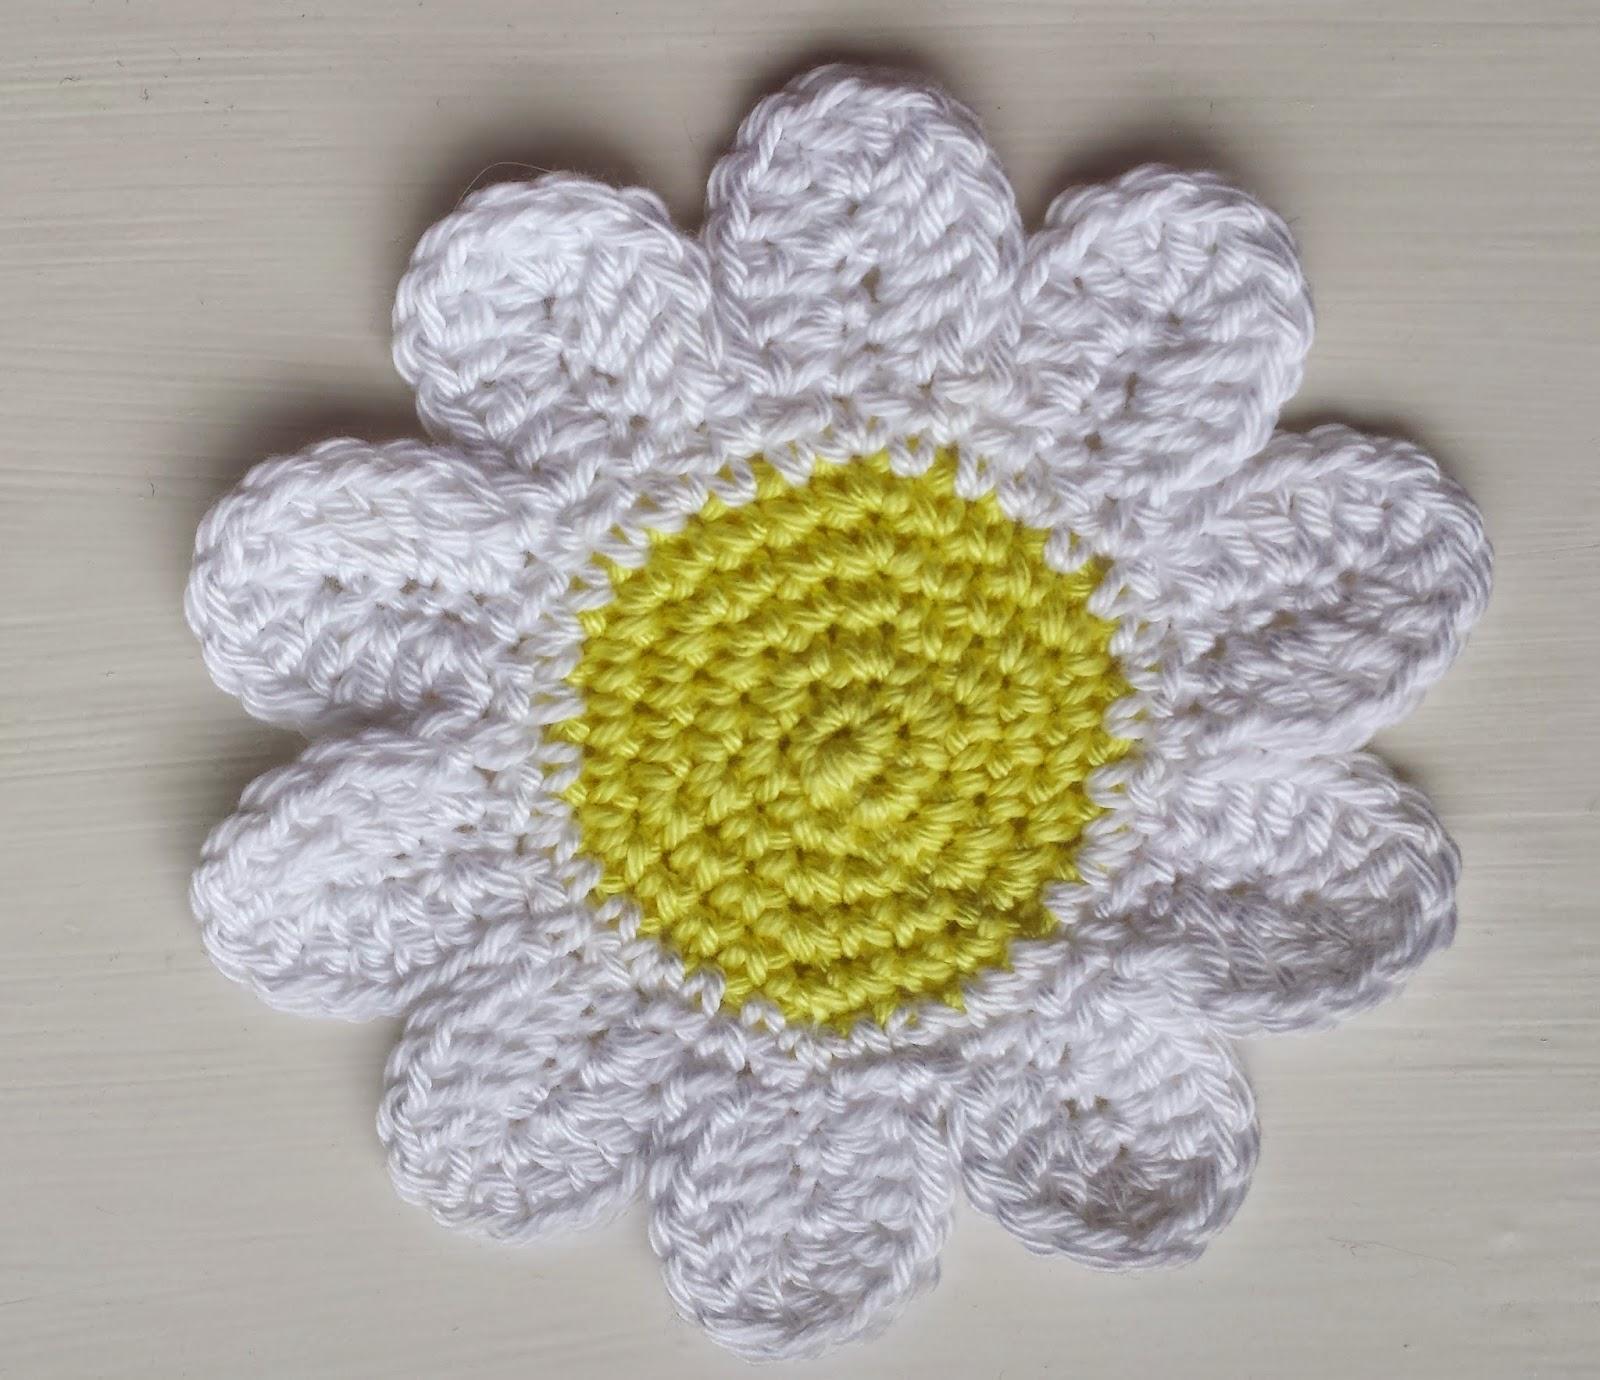 Craigloves2crochet how to crochet a trio of daisies ten petal daisy izmirmasajfo